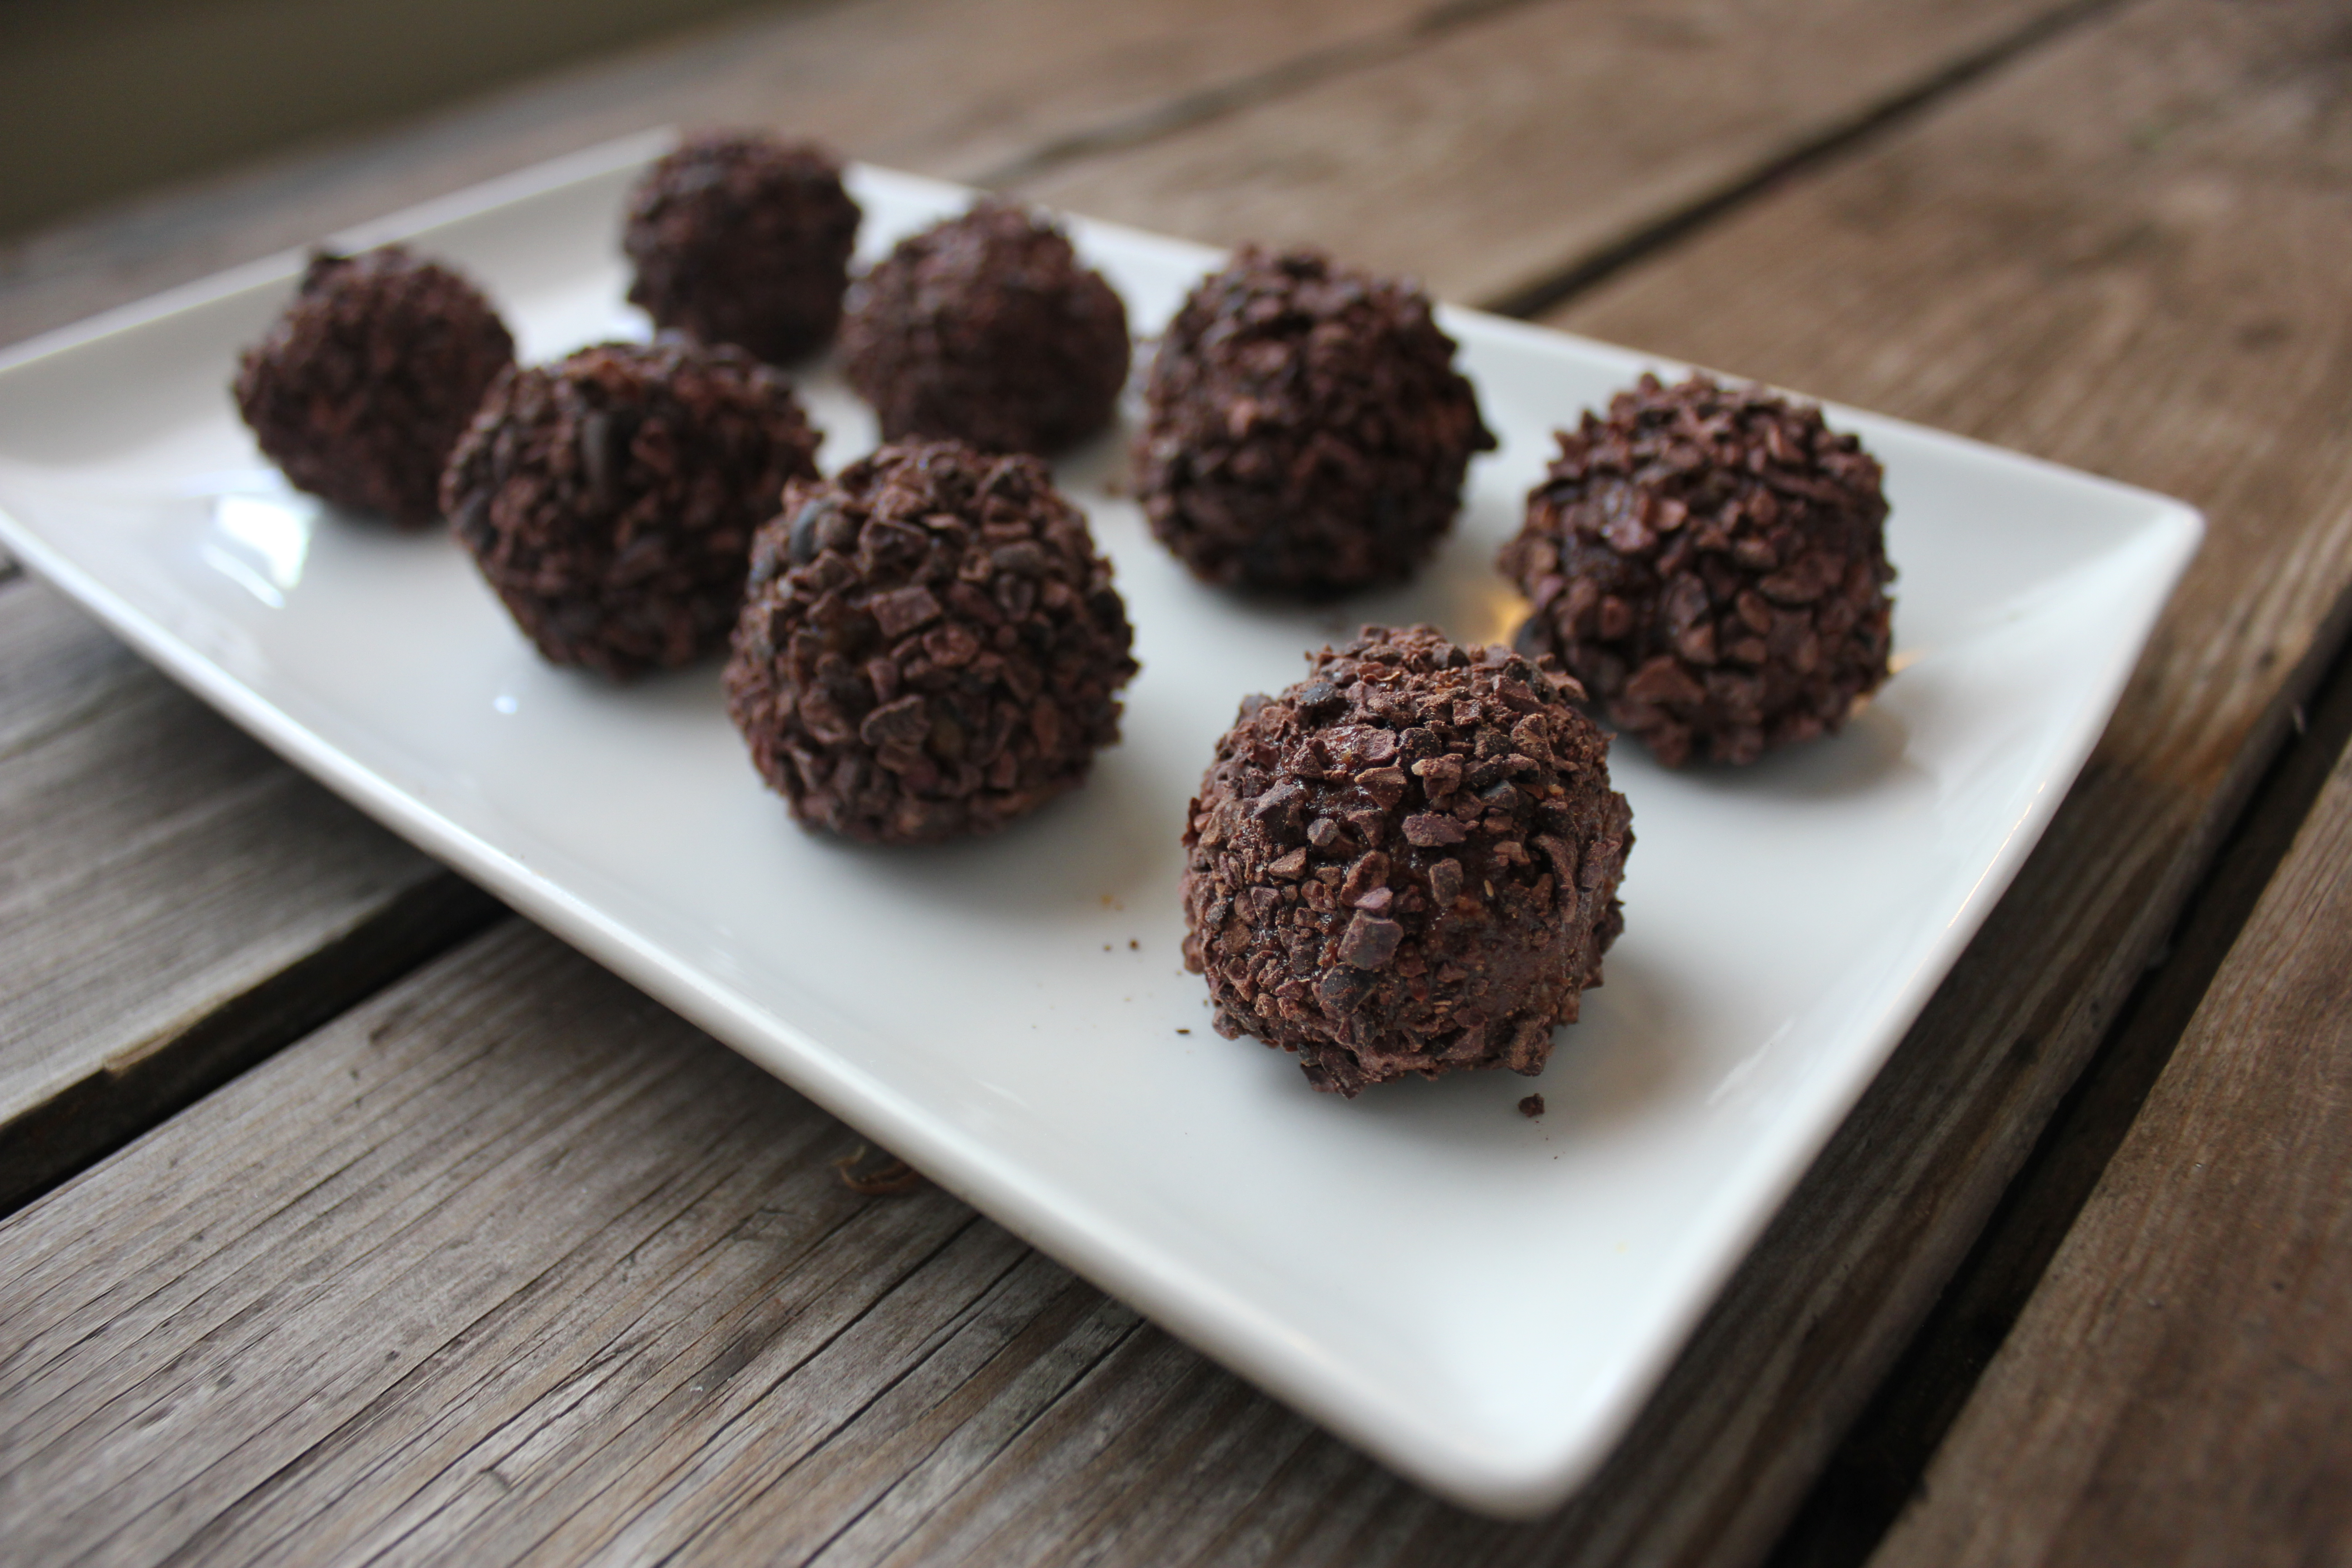 Brigadeiros, Brazilian chocolate truffles reinvented